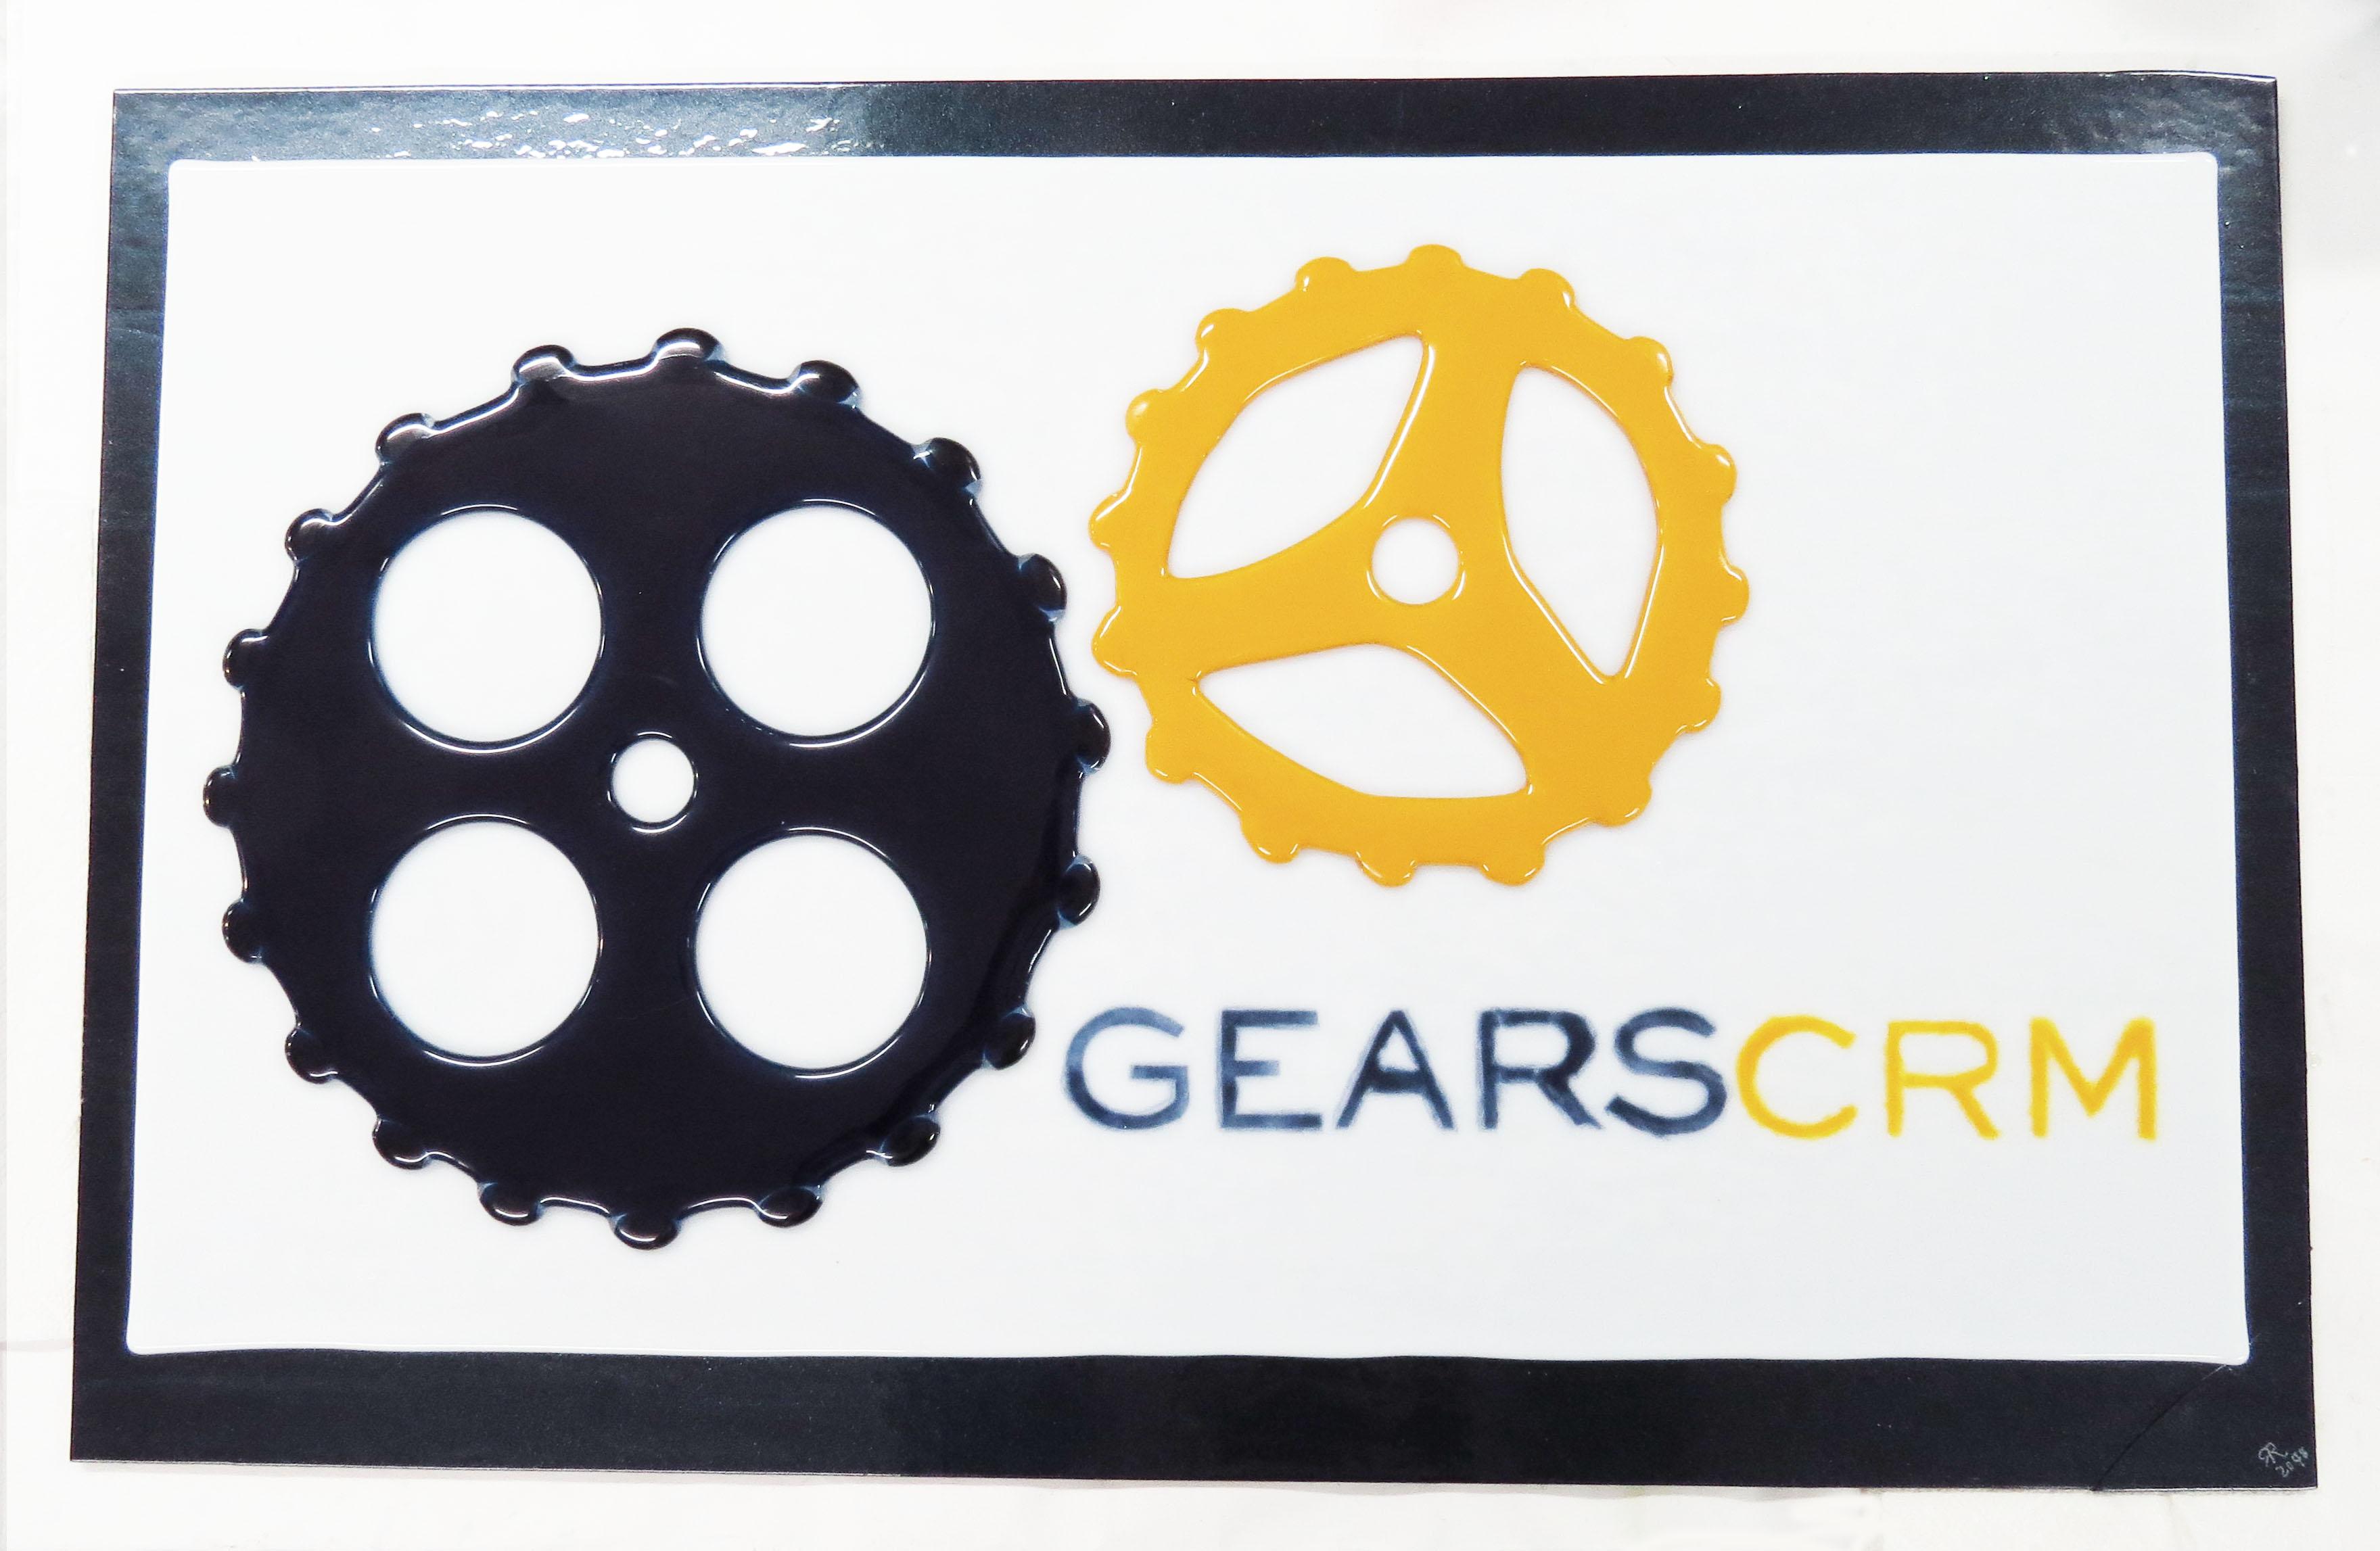 Gears CRM